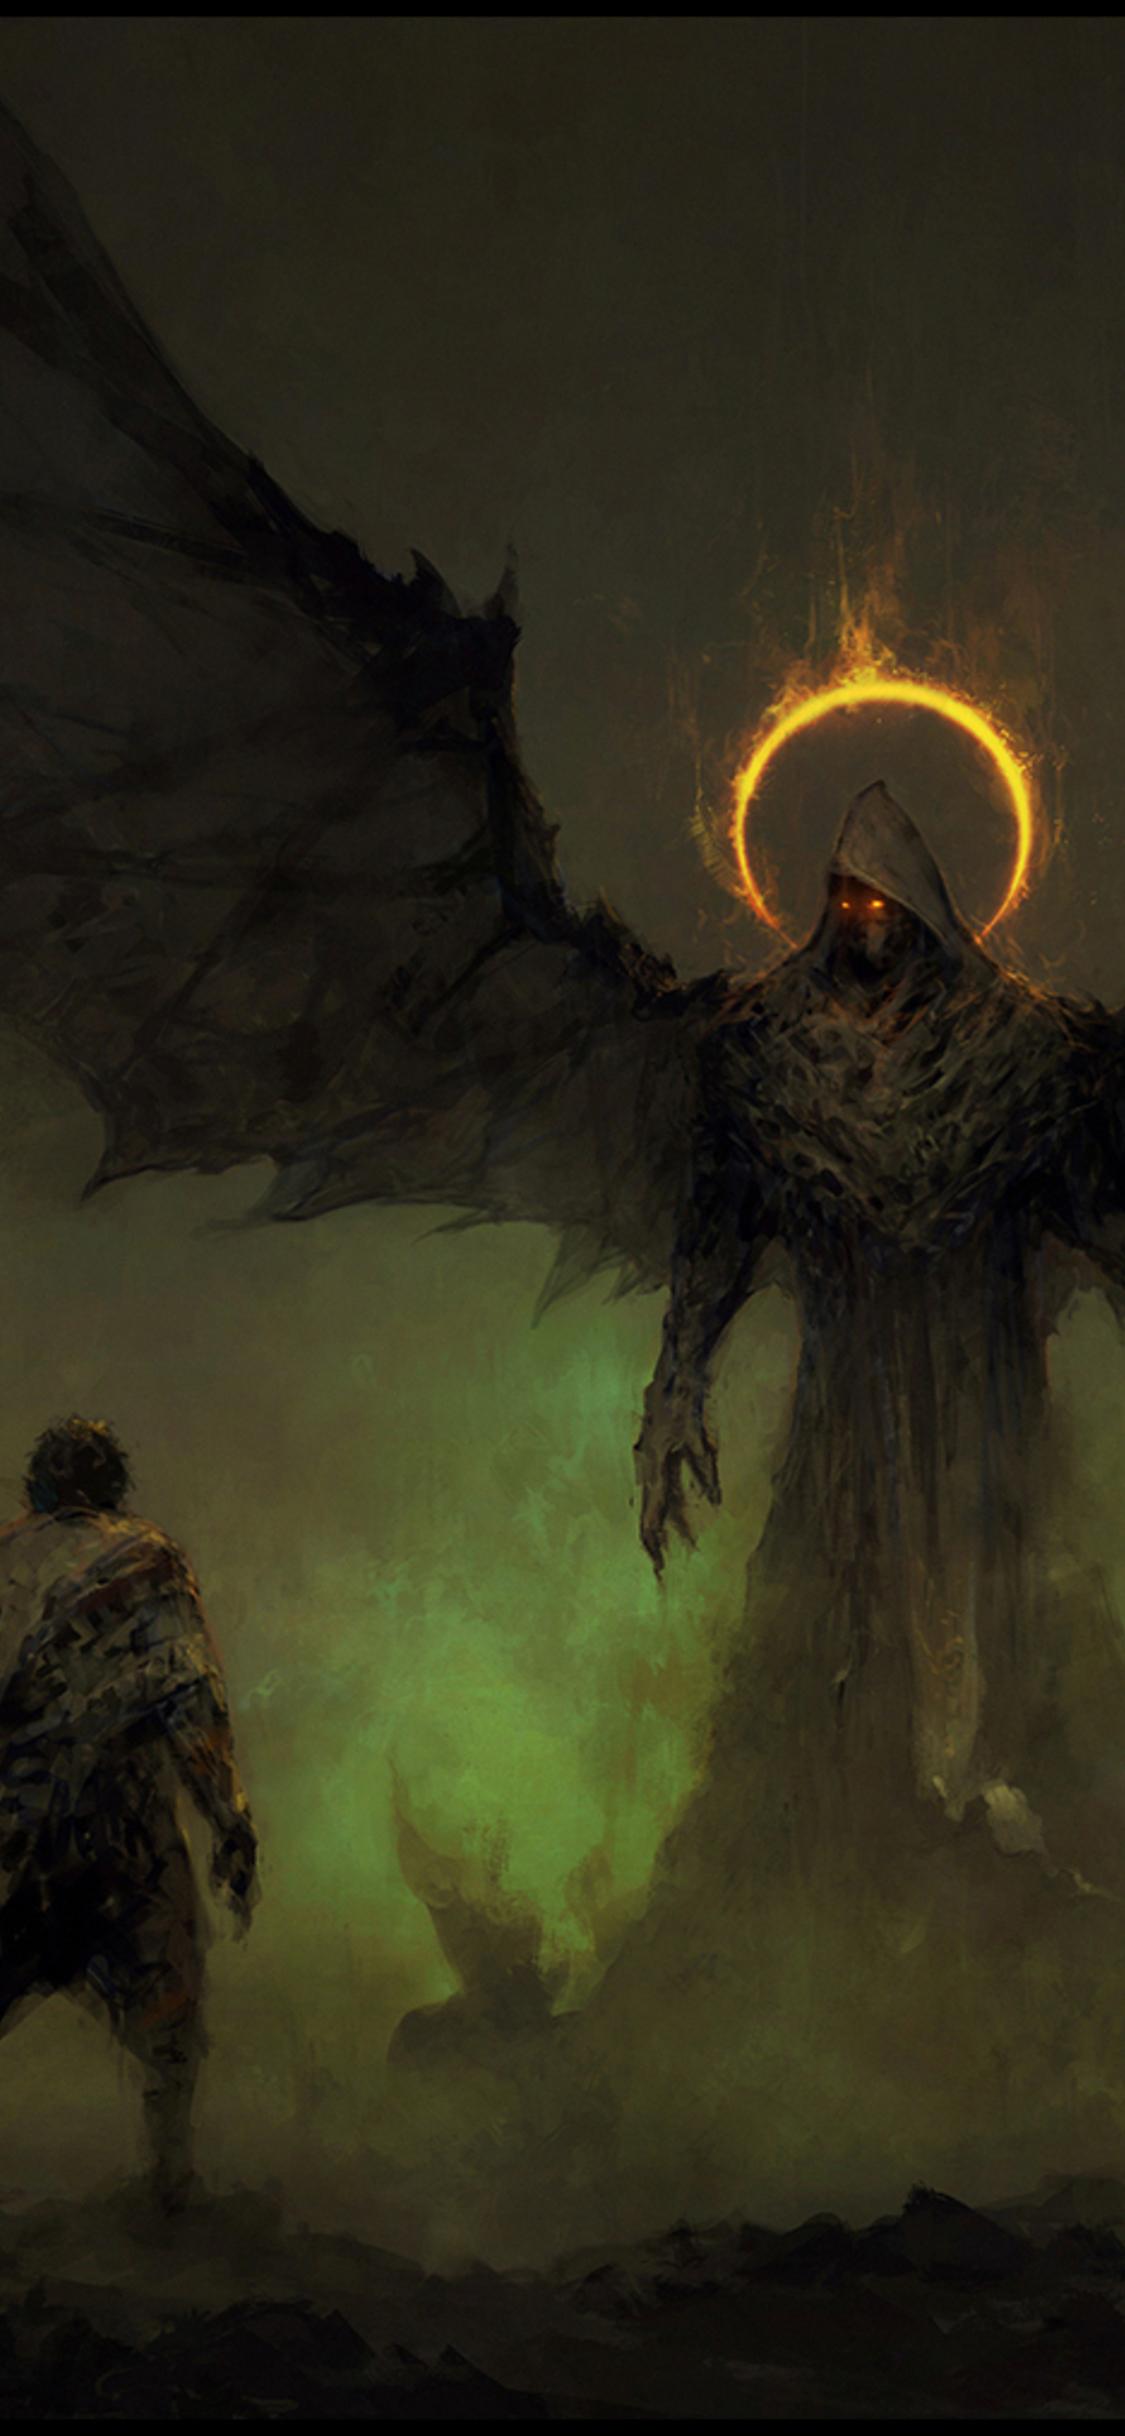 Angel And Devil Wallpaper : angel, devil, wallpaper, Angel, Devil, Wallpapers, Wallpaper